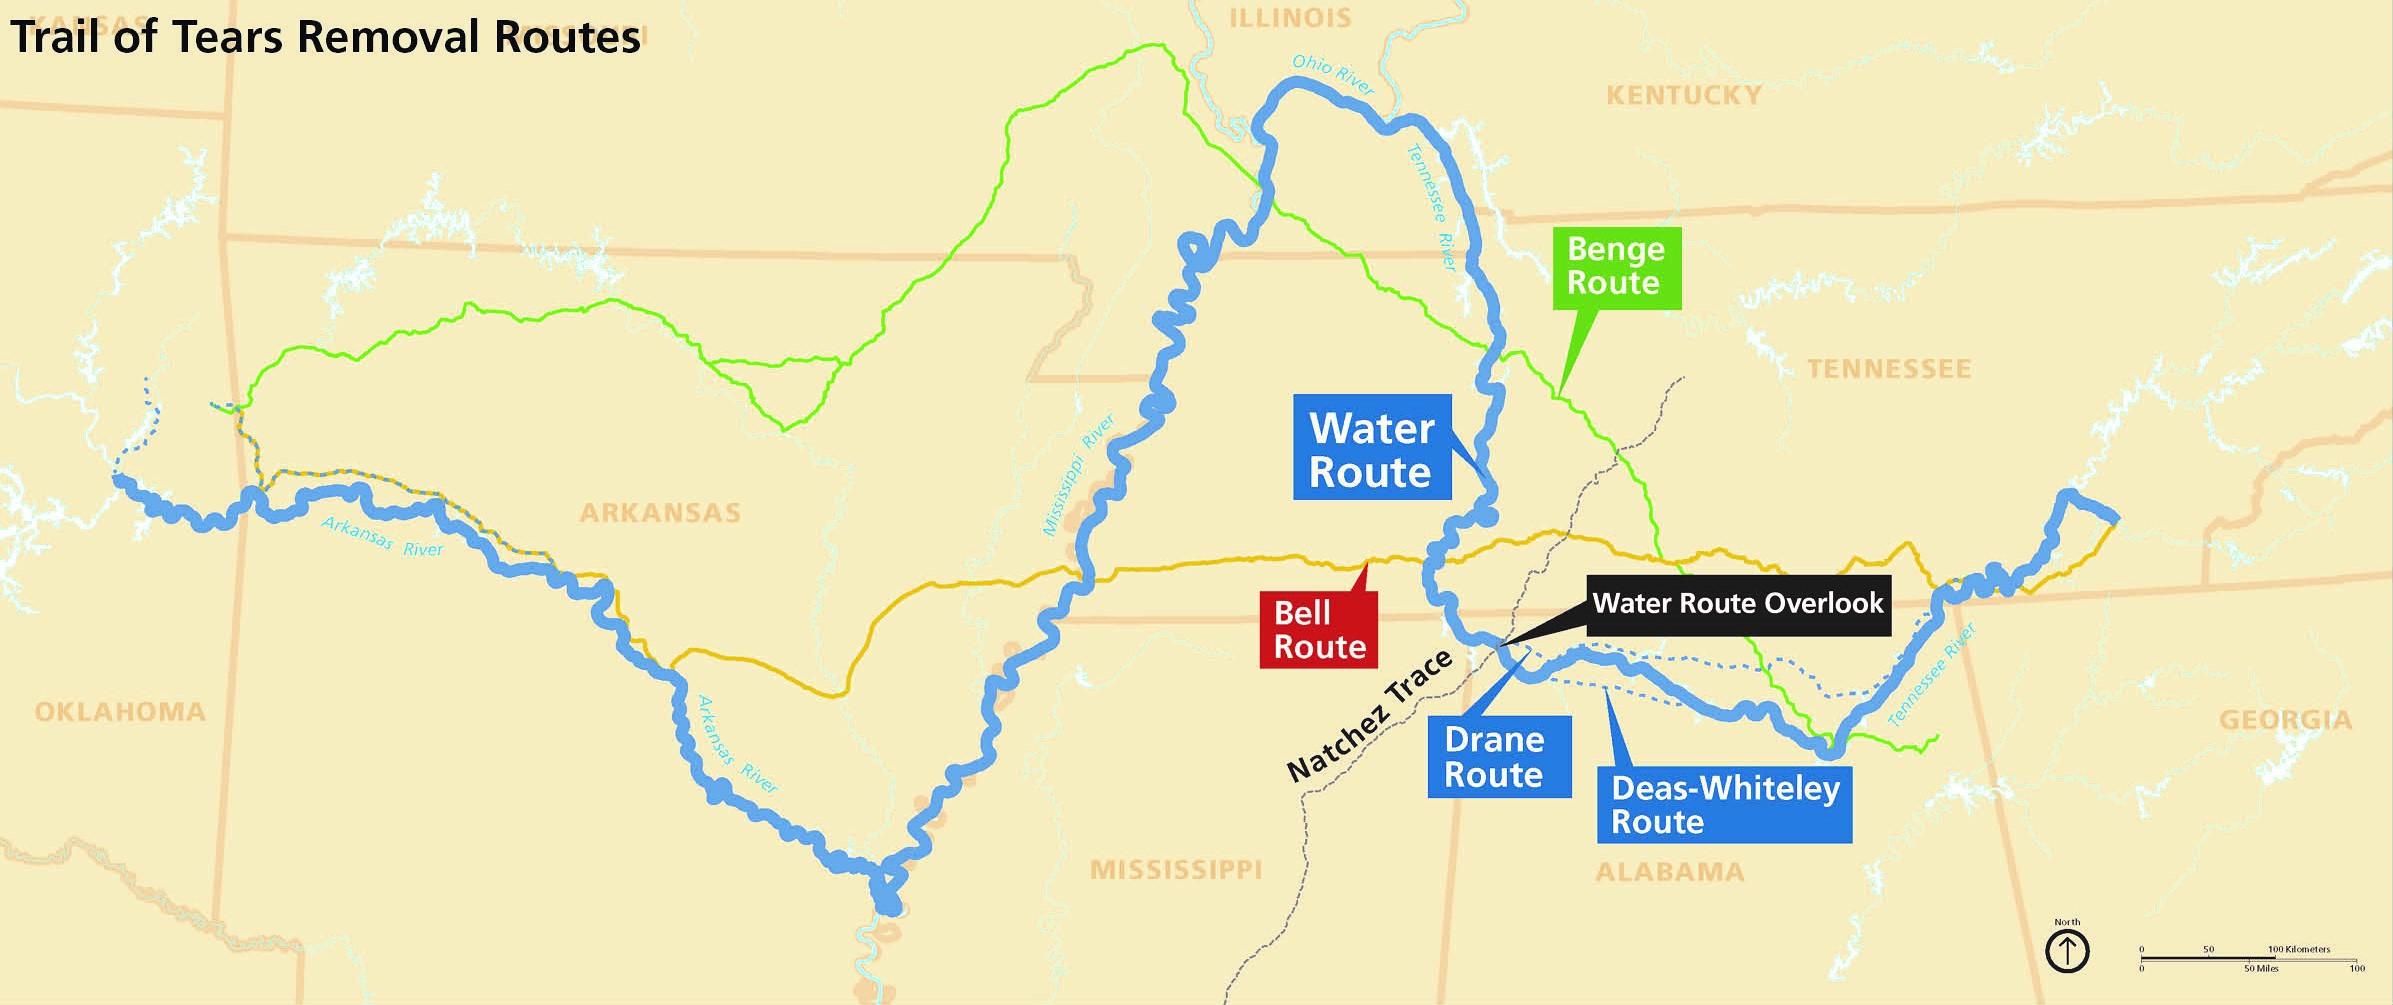 Trail of Tears on the Natchez Trace - Natchez Trace Parkway